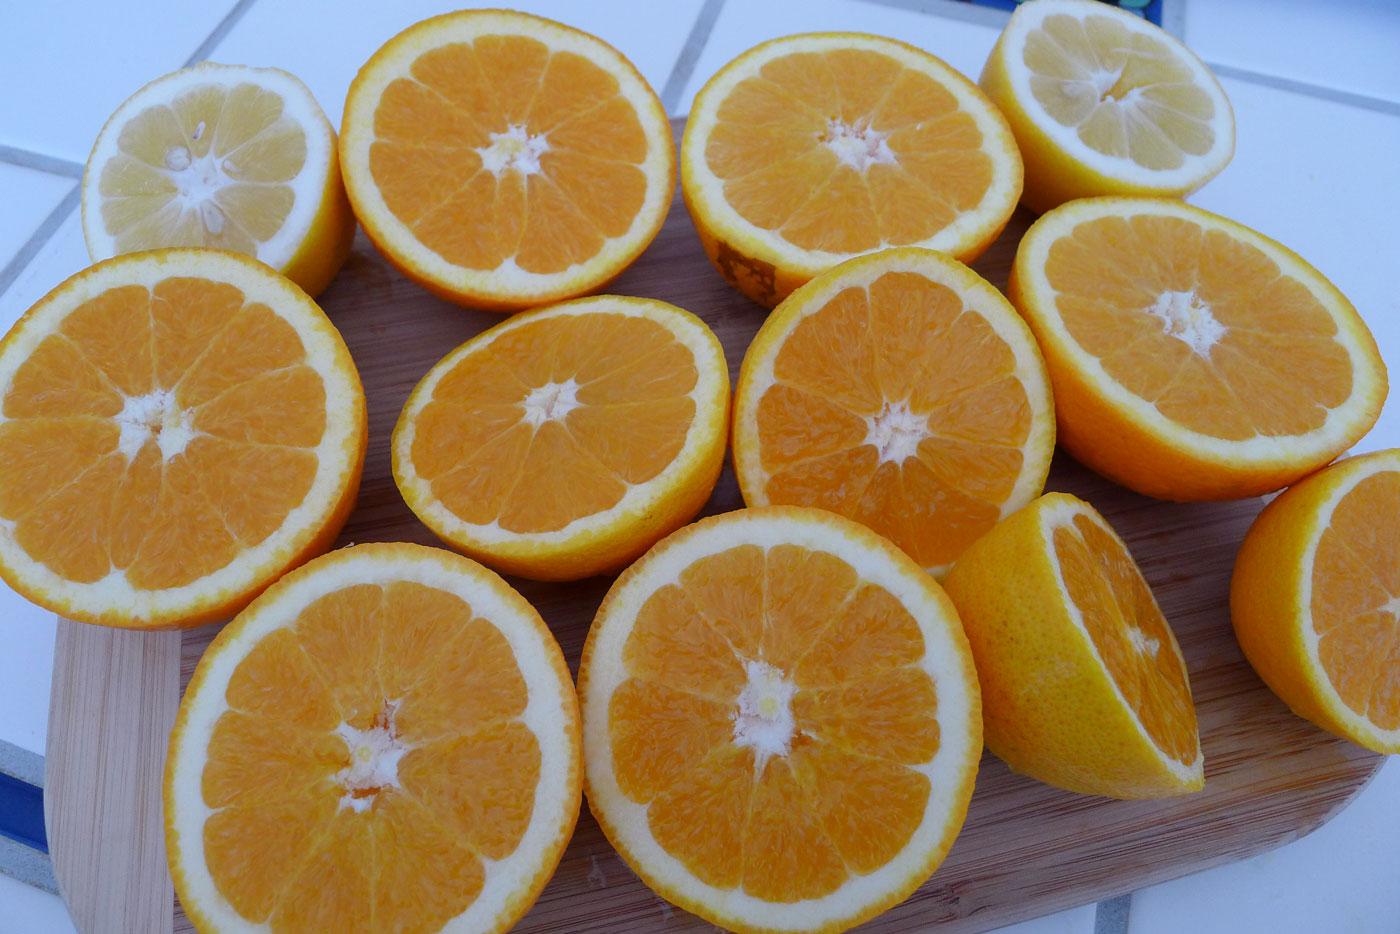 oranges and one meyer lemon